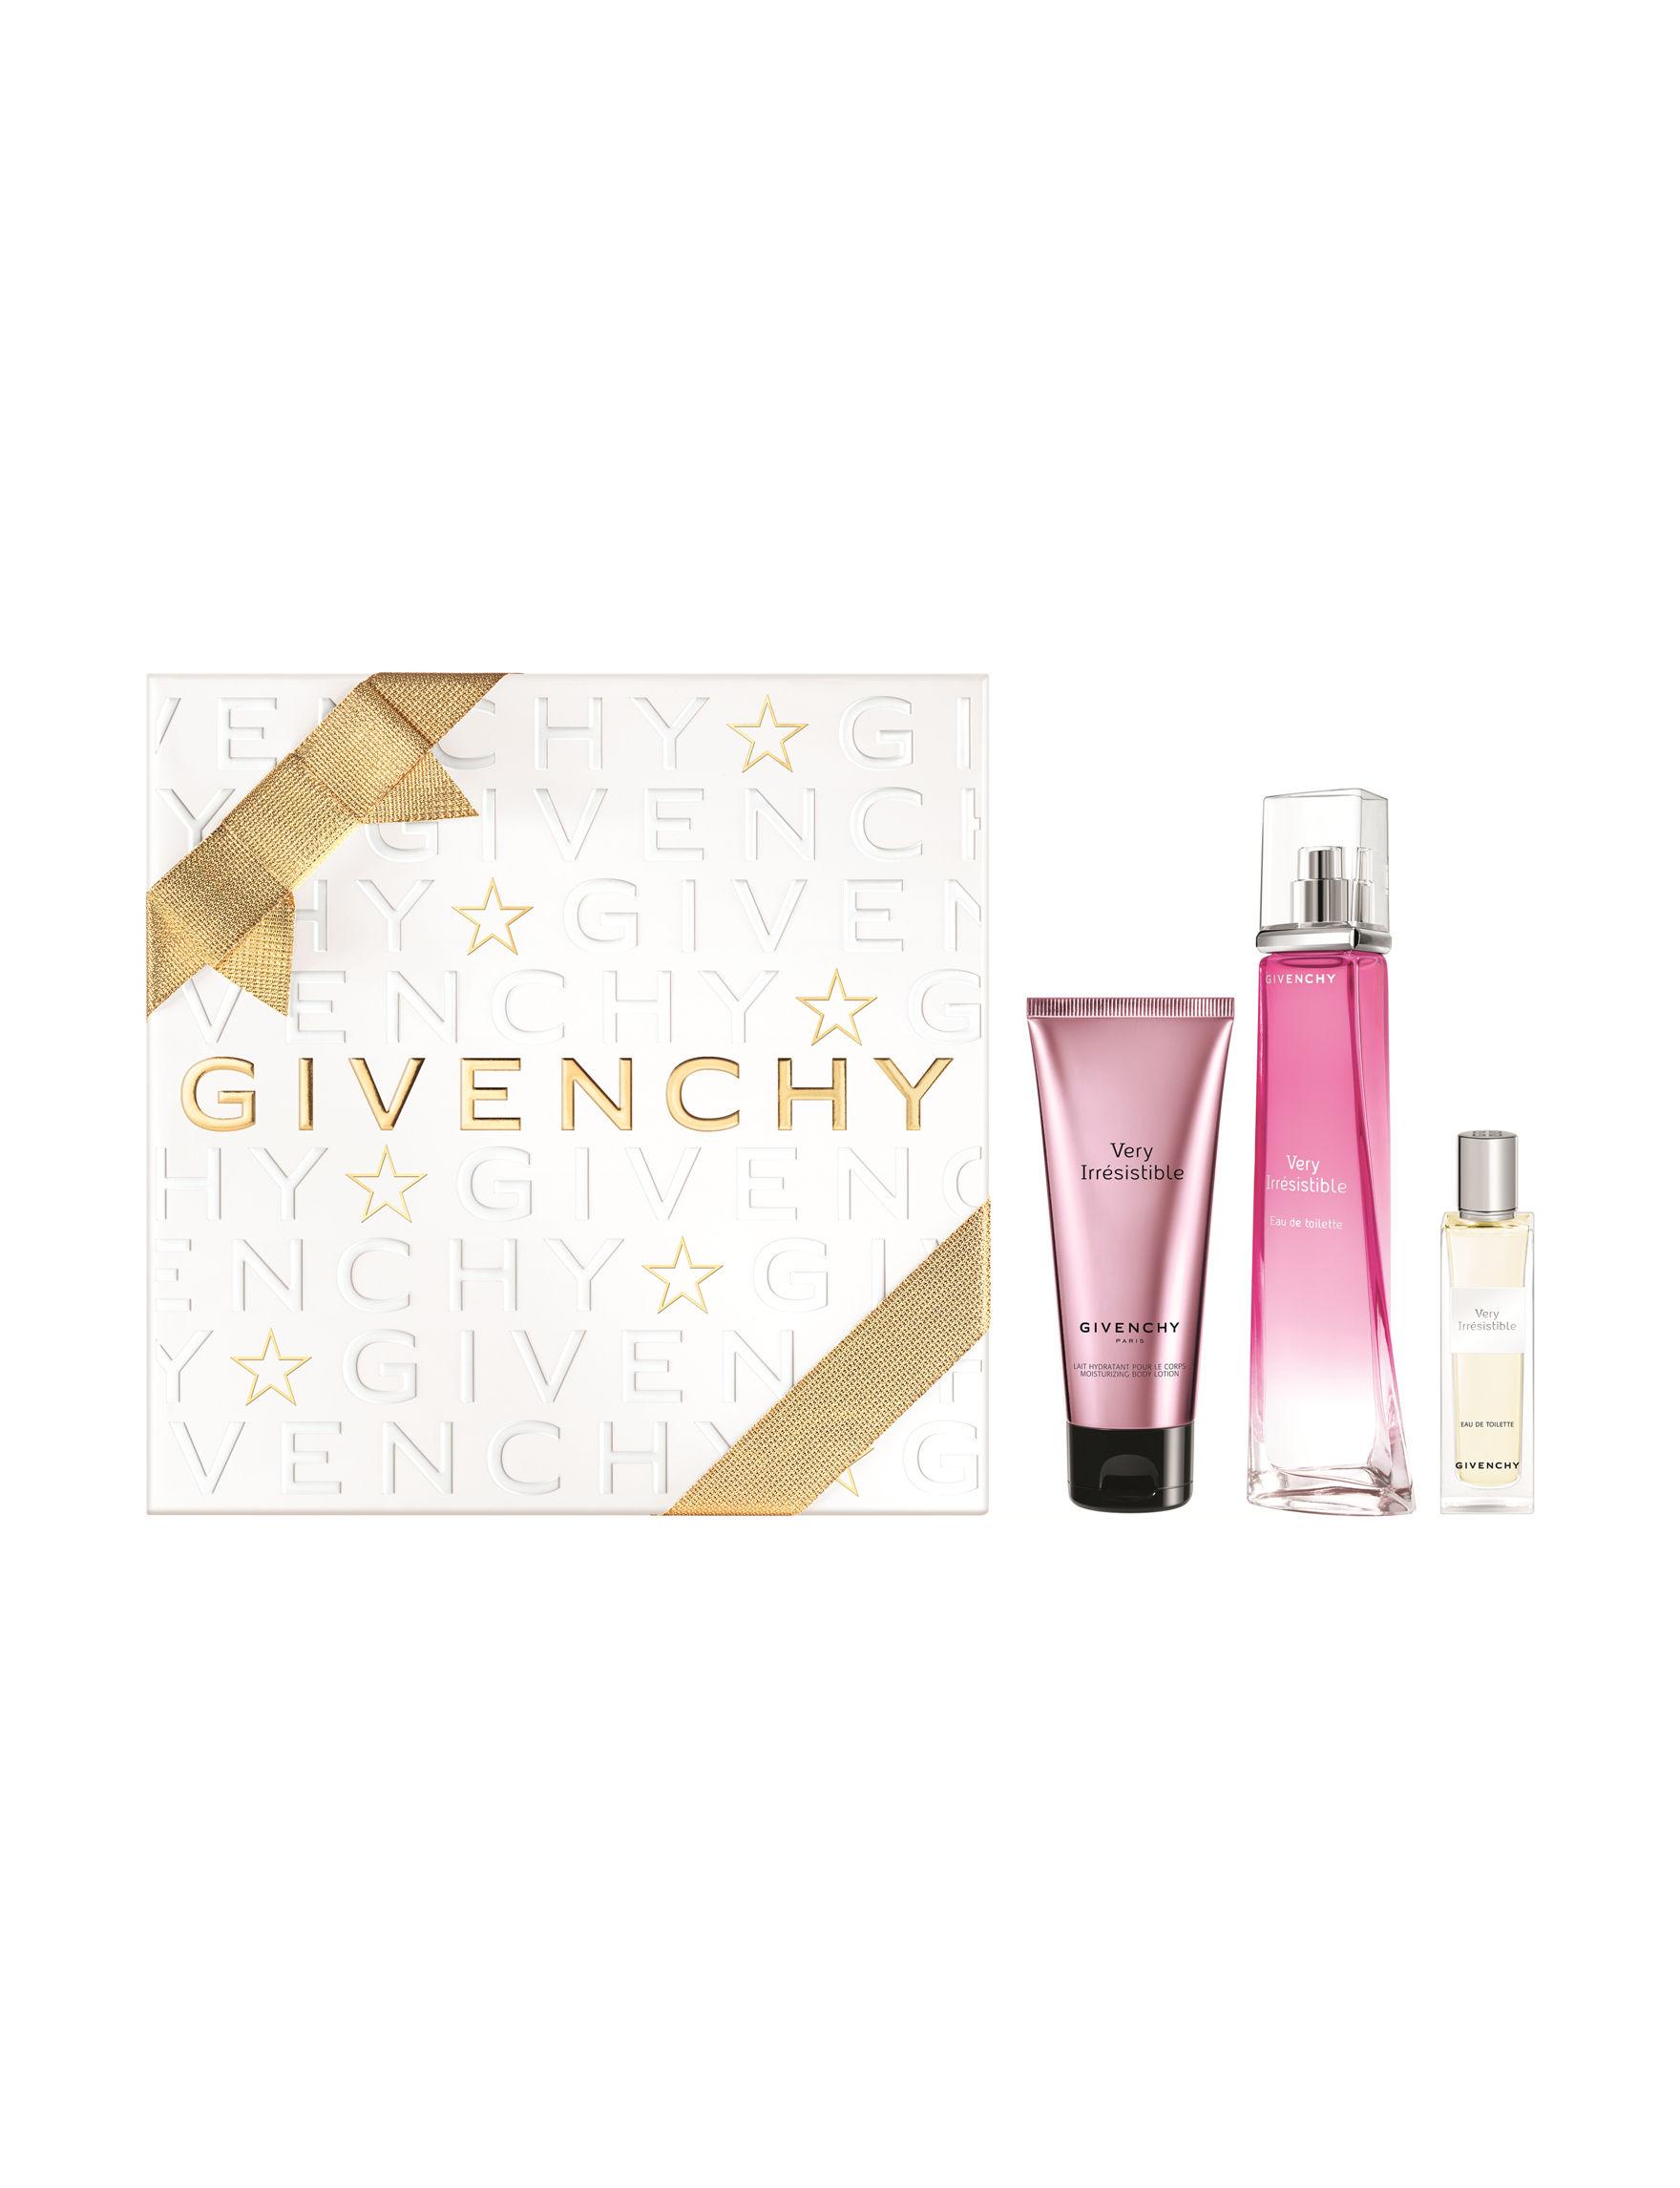 Givenchy  Fragrance Gift Sets